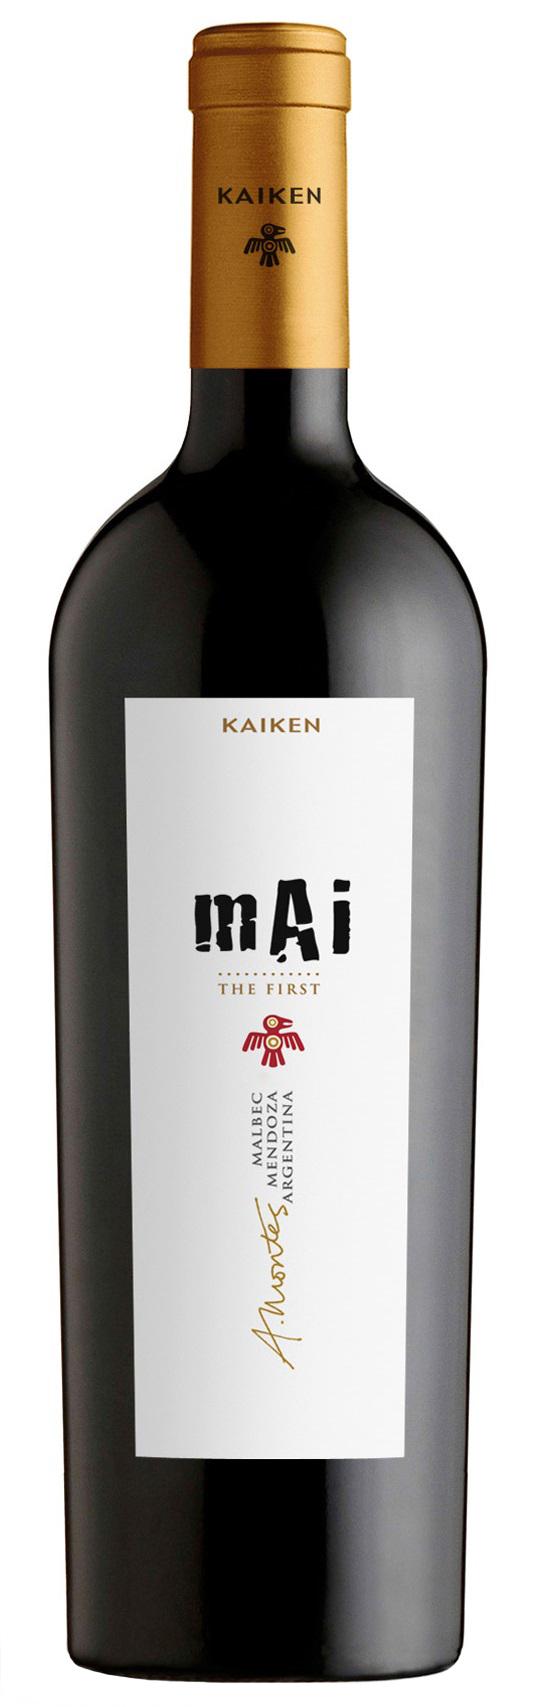 Kaiken, 'Mai' Mendoza Malbec 2013